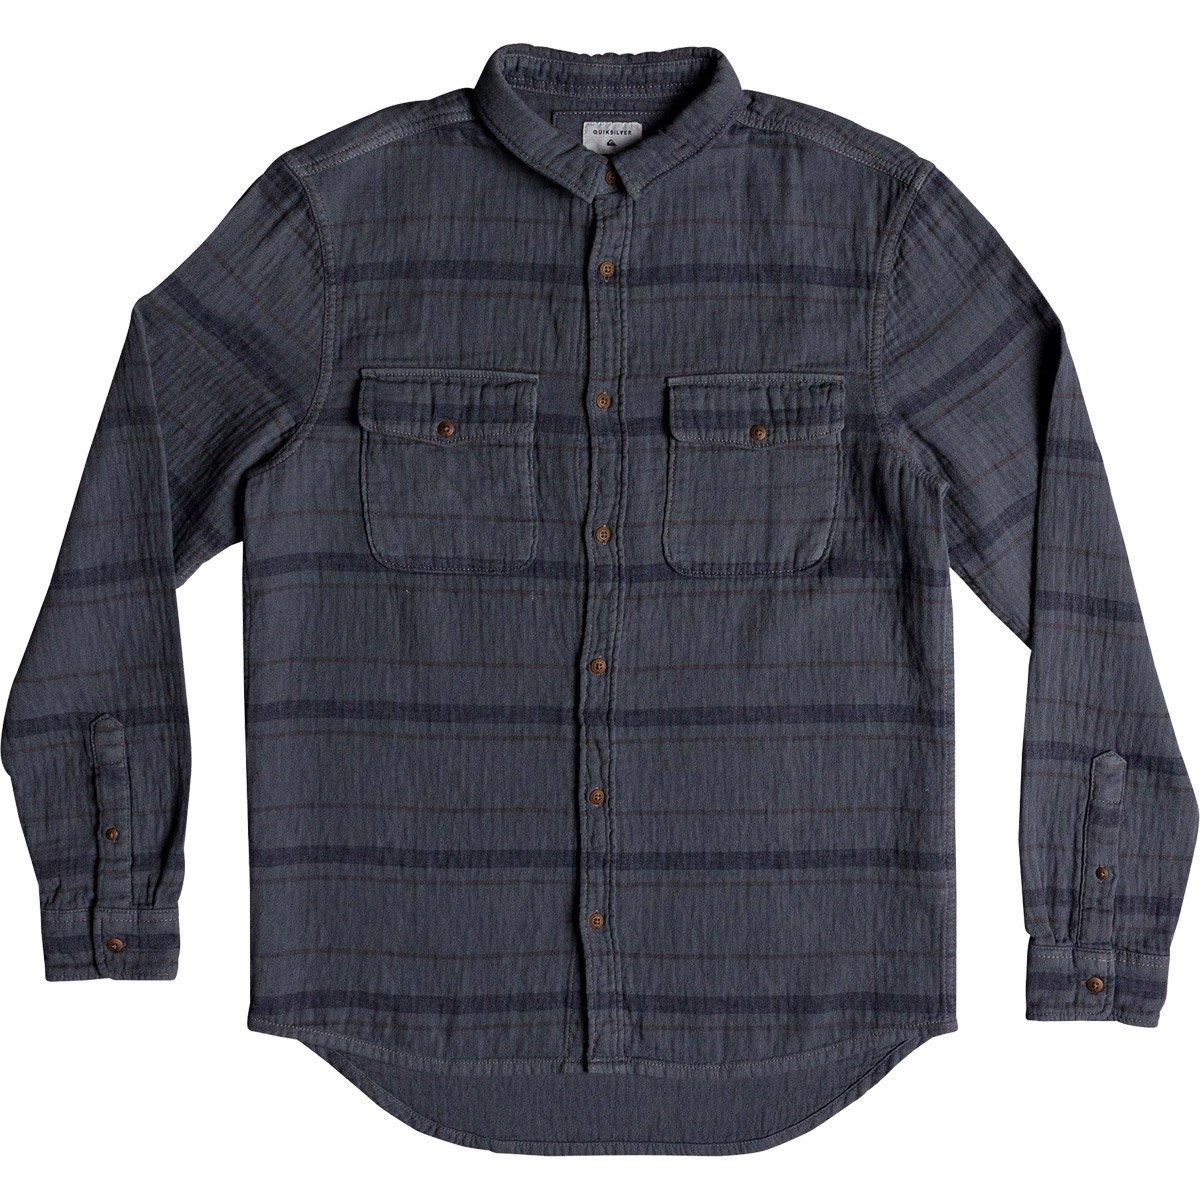 Quiksilver Men's Hamada Life Button Down Flannel Shirt, Iron Gate Striped Flannel, M